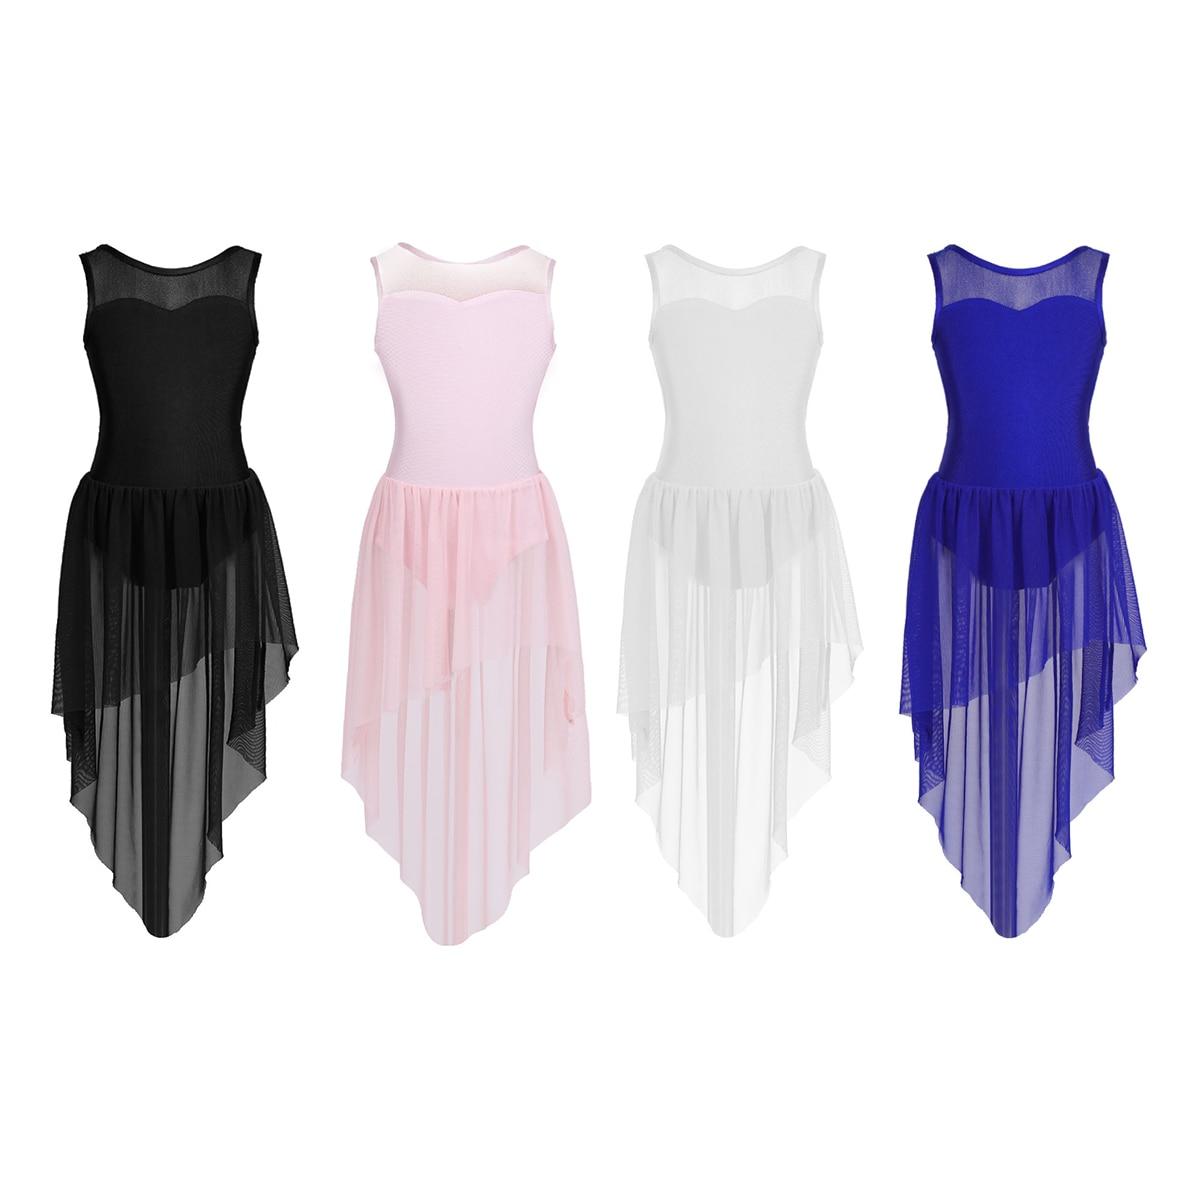 MSemis Girls Shiny Sequins Camisole Ballet Tutu Dress Gymnastics Leotard Lyrical Latin Jazz Modern High Low Dance Dress